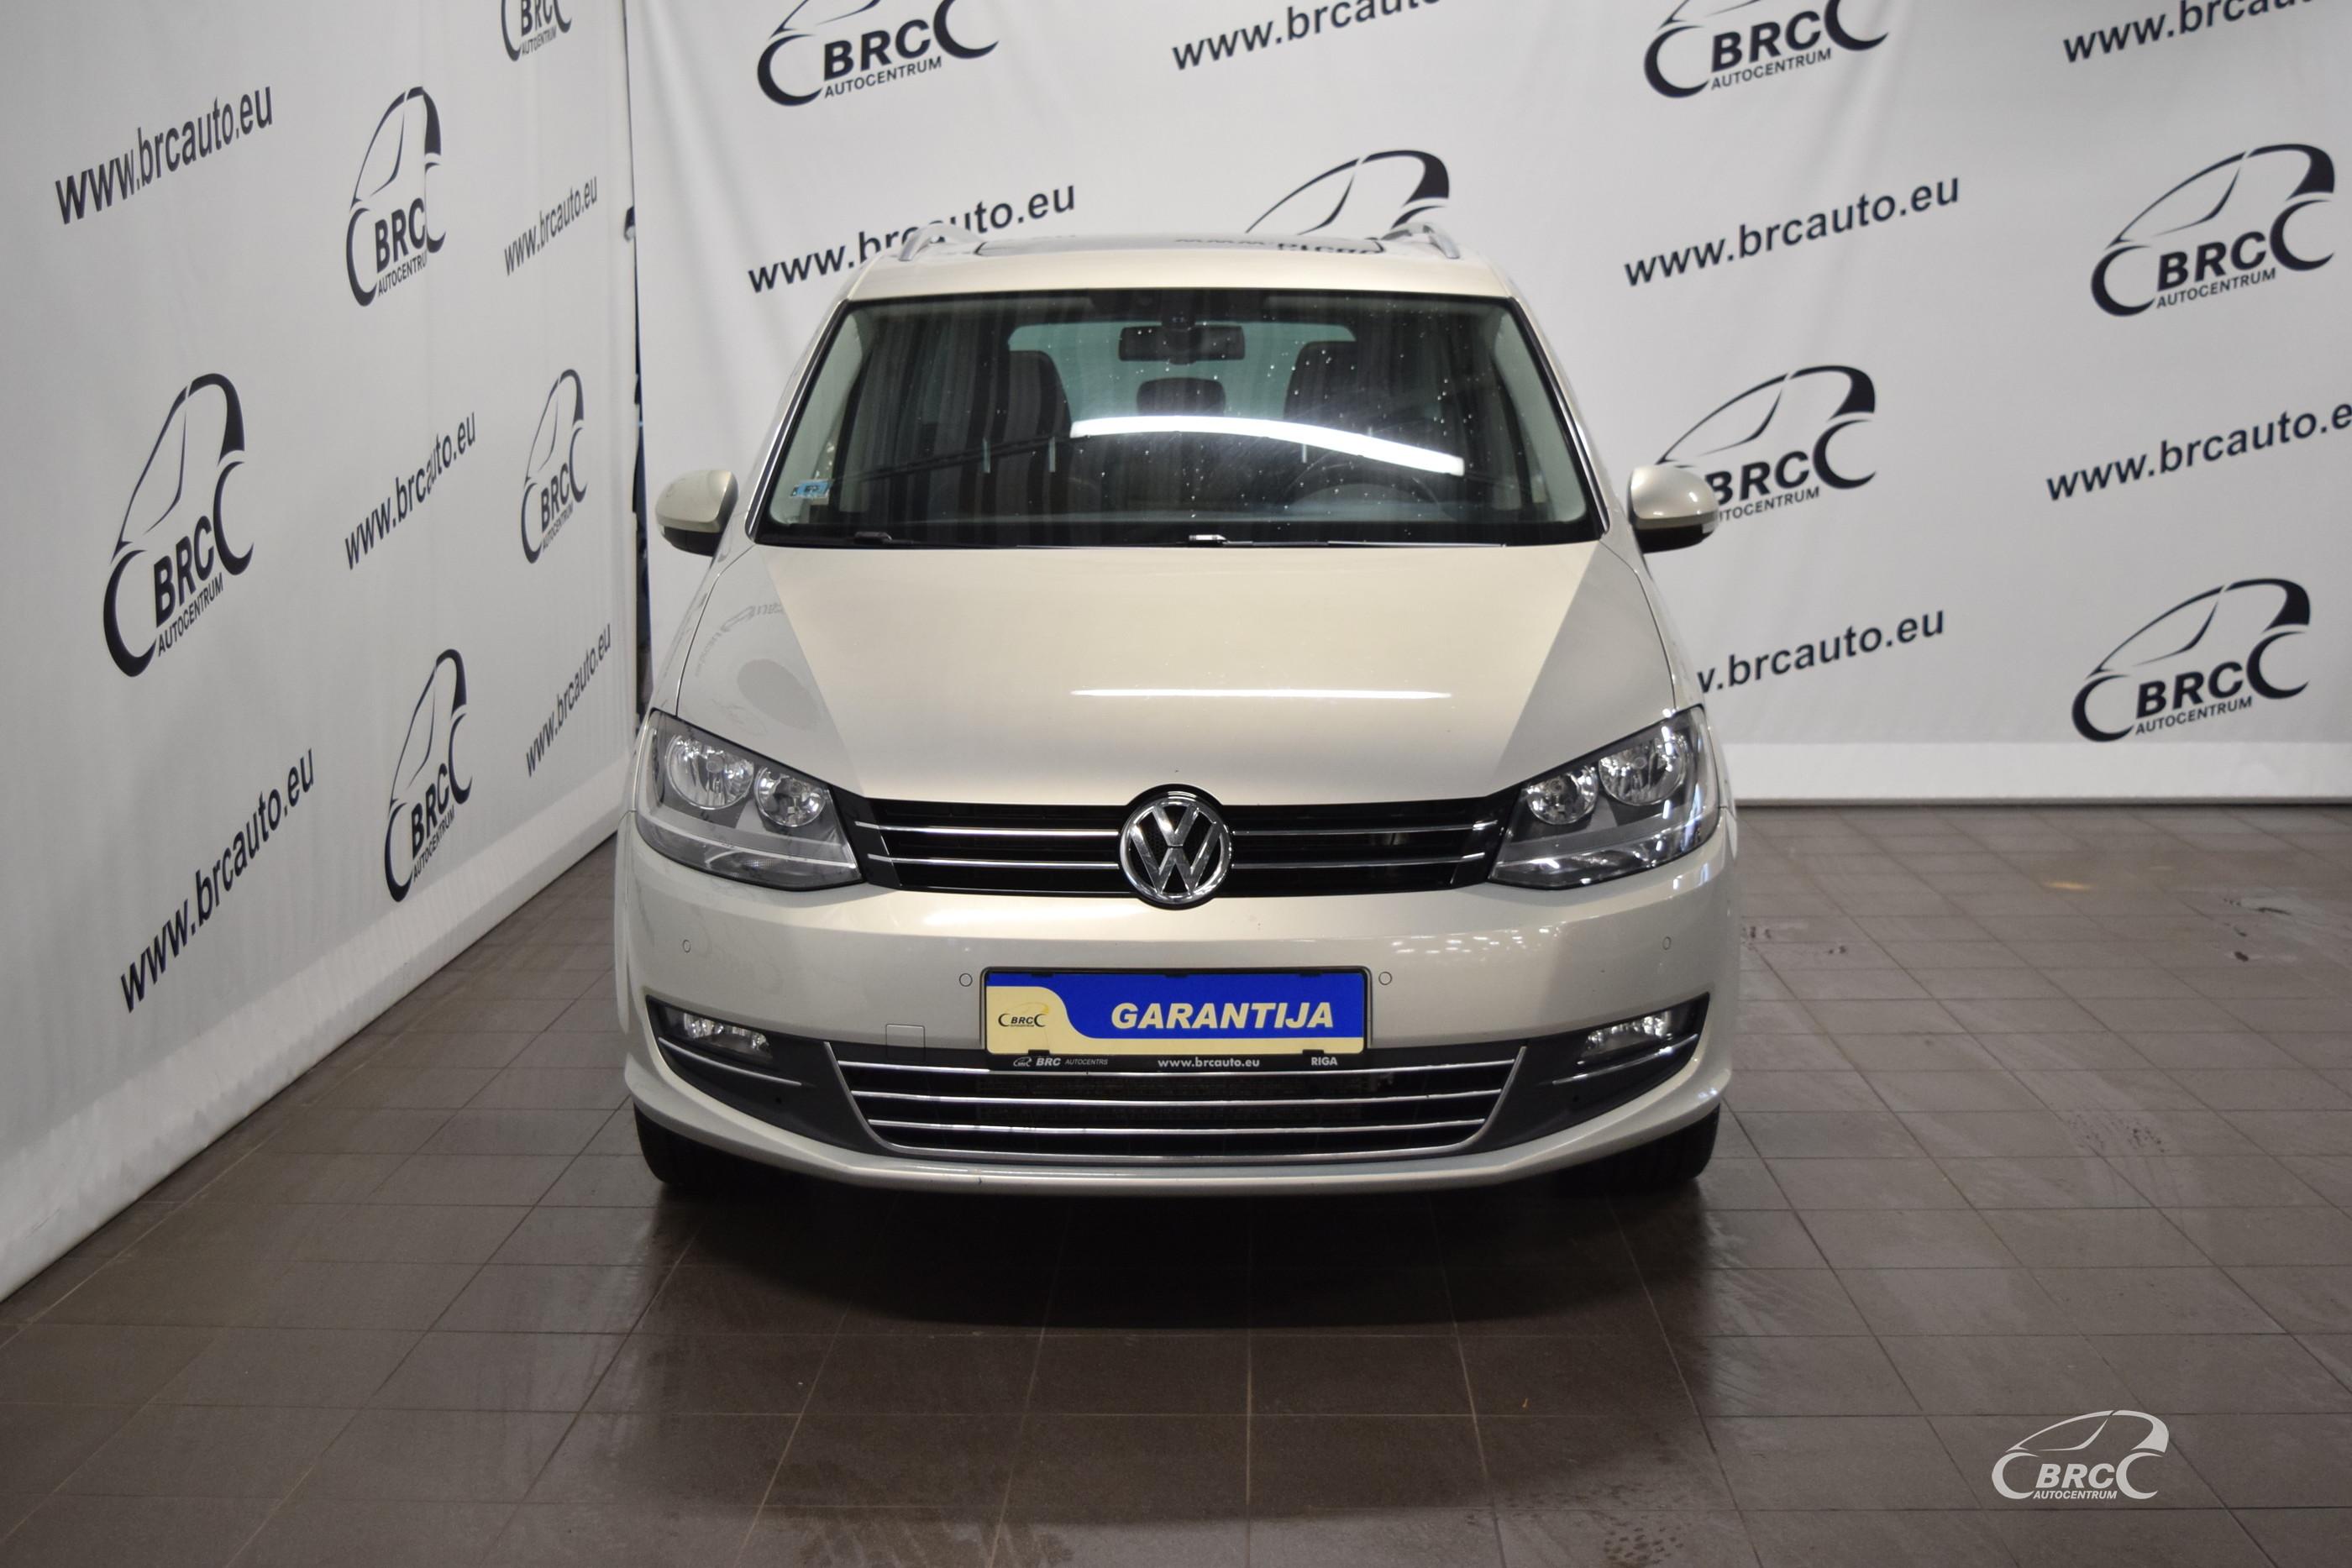 Volkswagen Sharan TDi DSG Bluemotion 7 seats